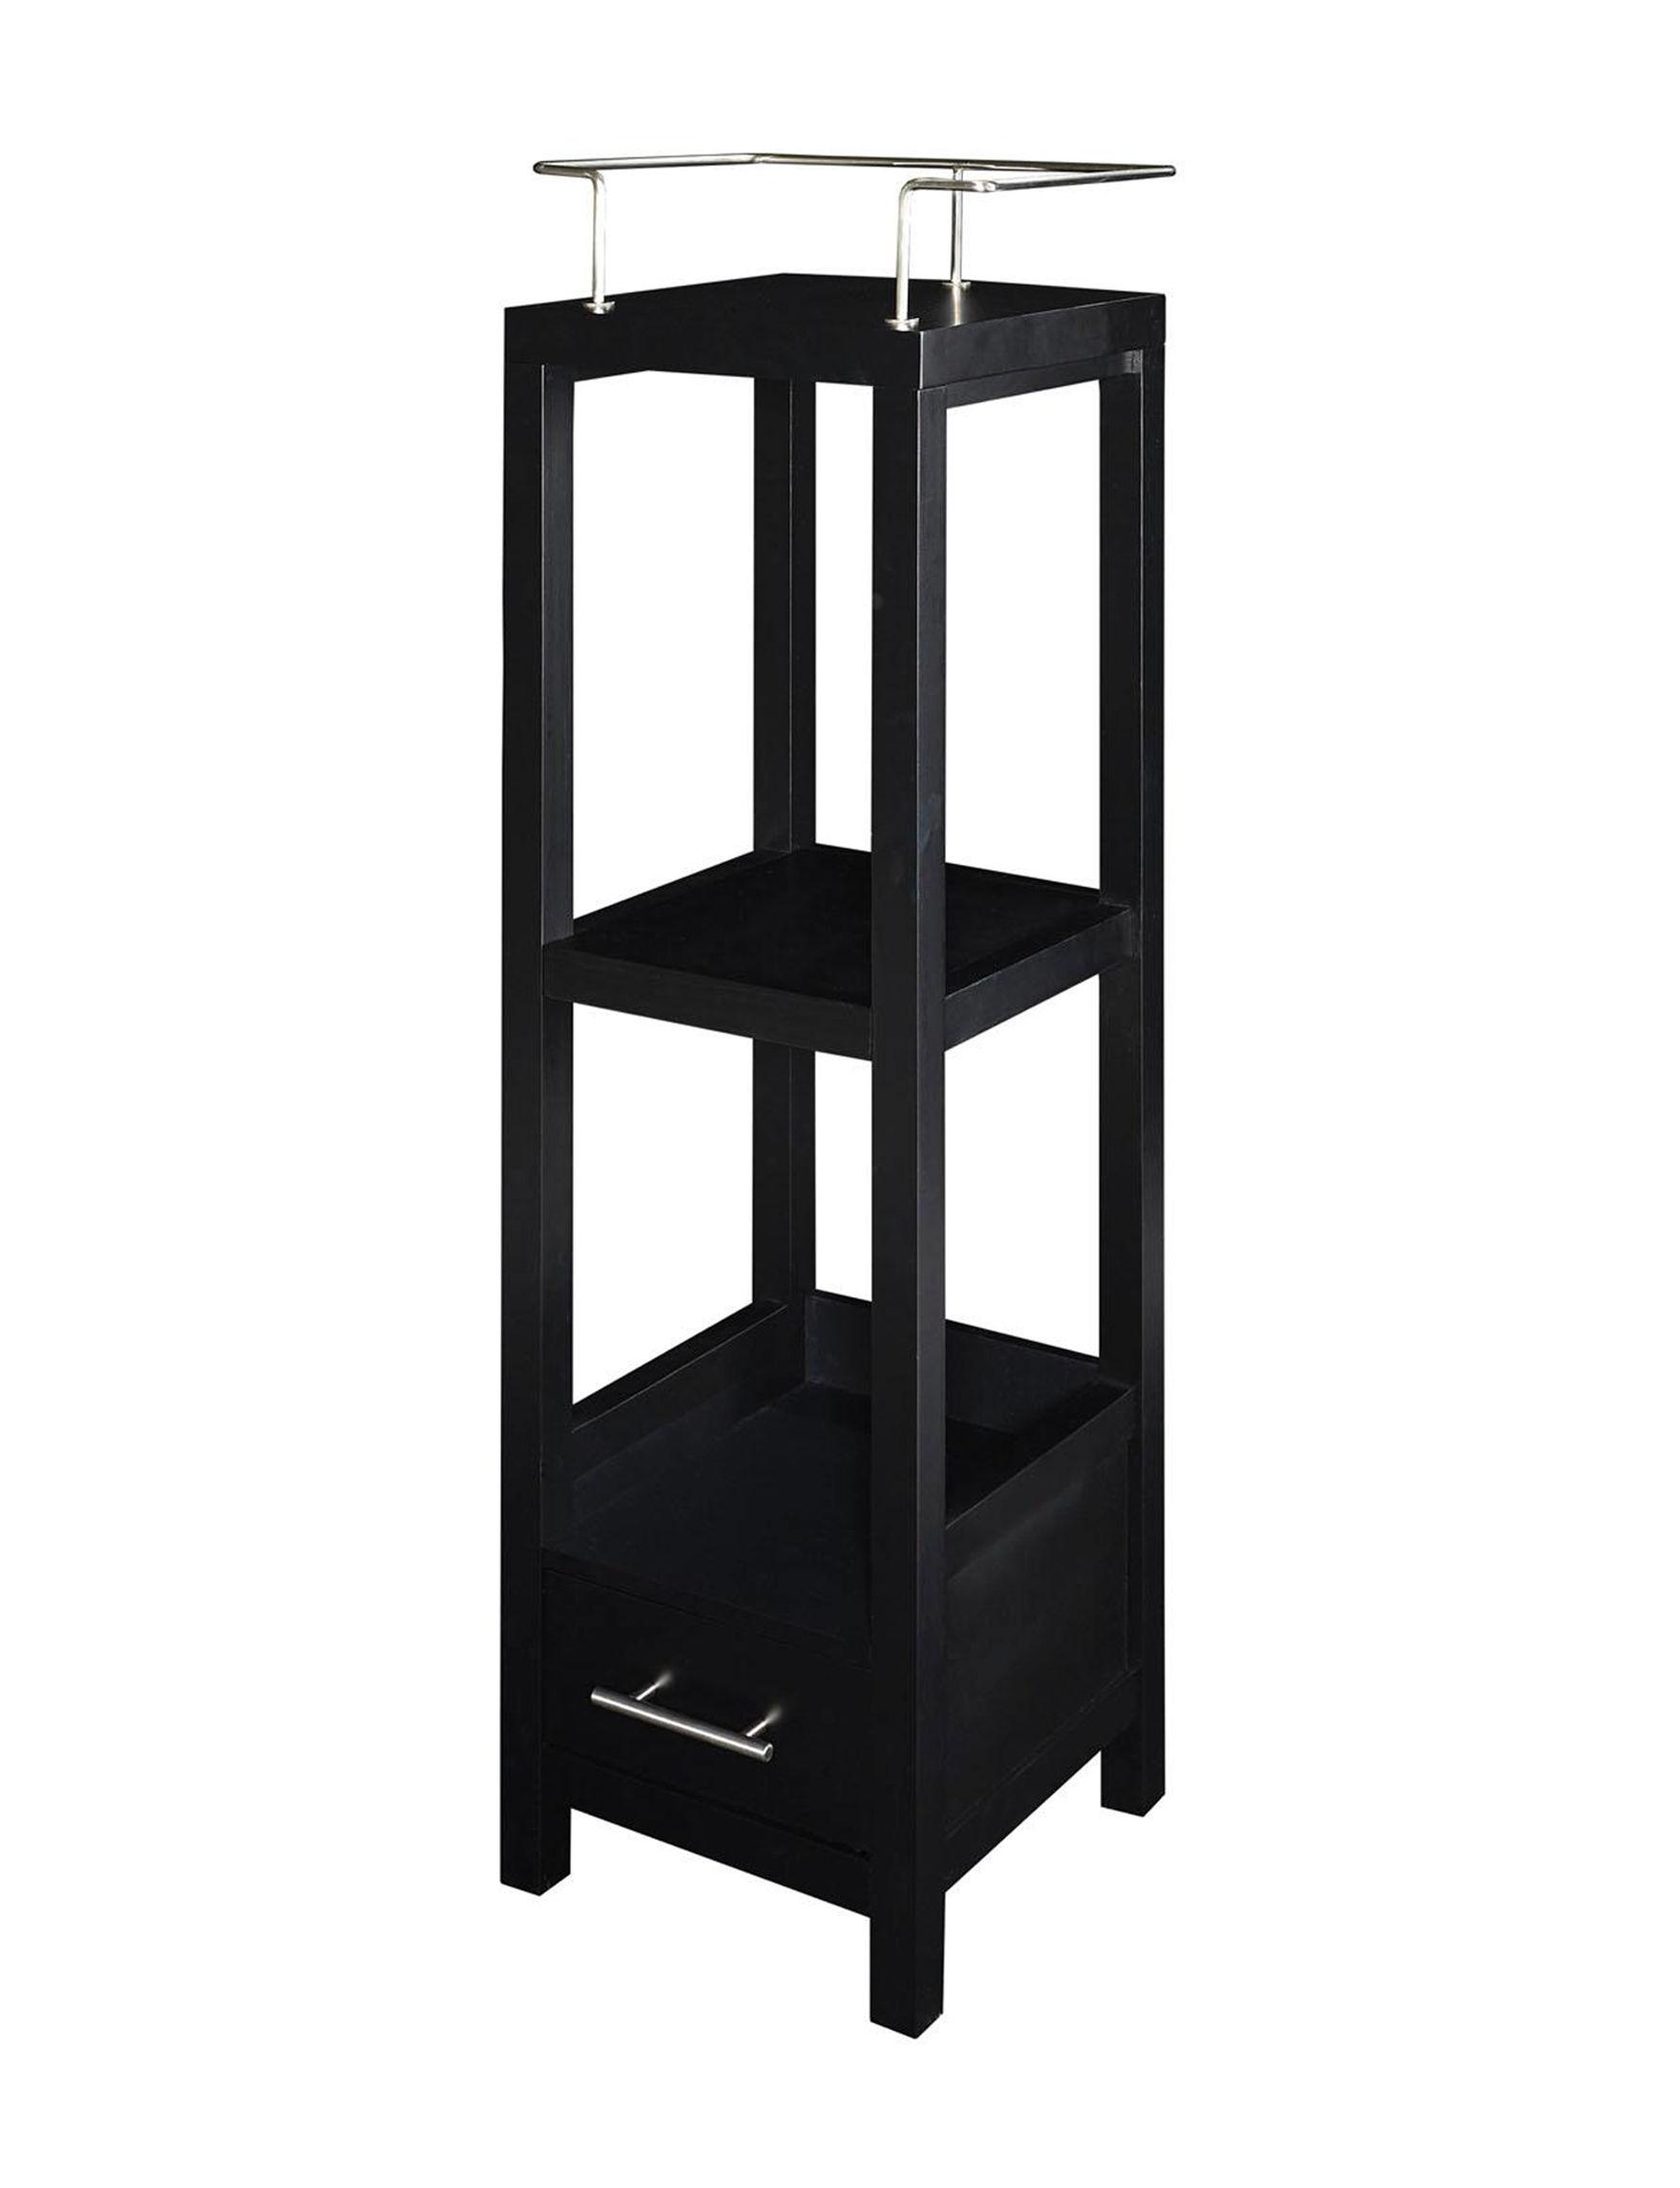 Linon Black Storage Shelves Bedroom Furniture